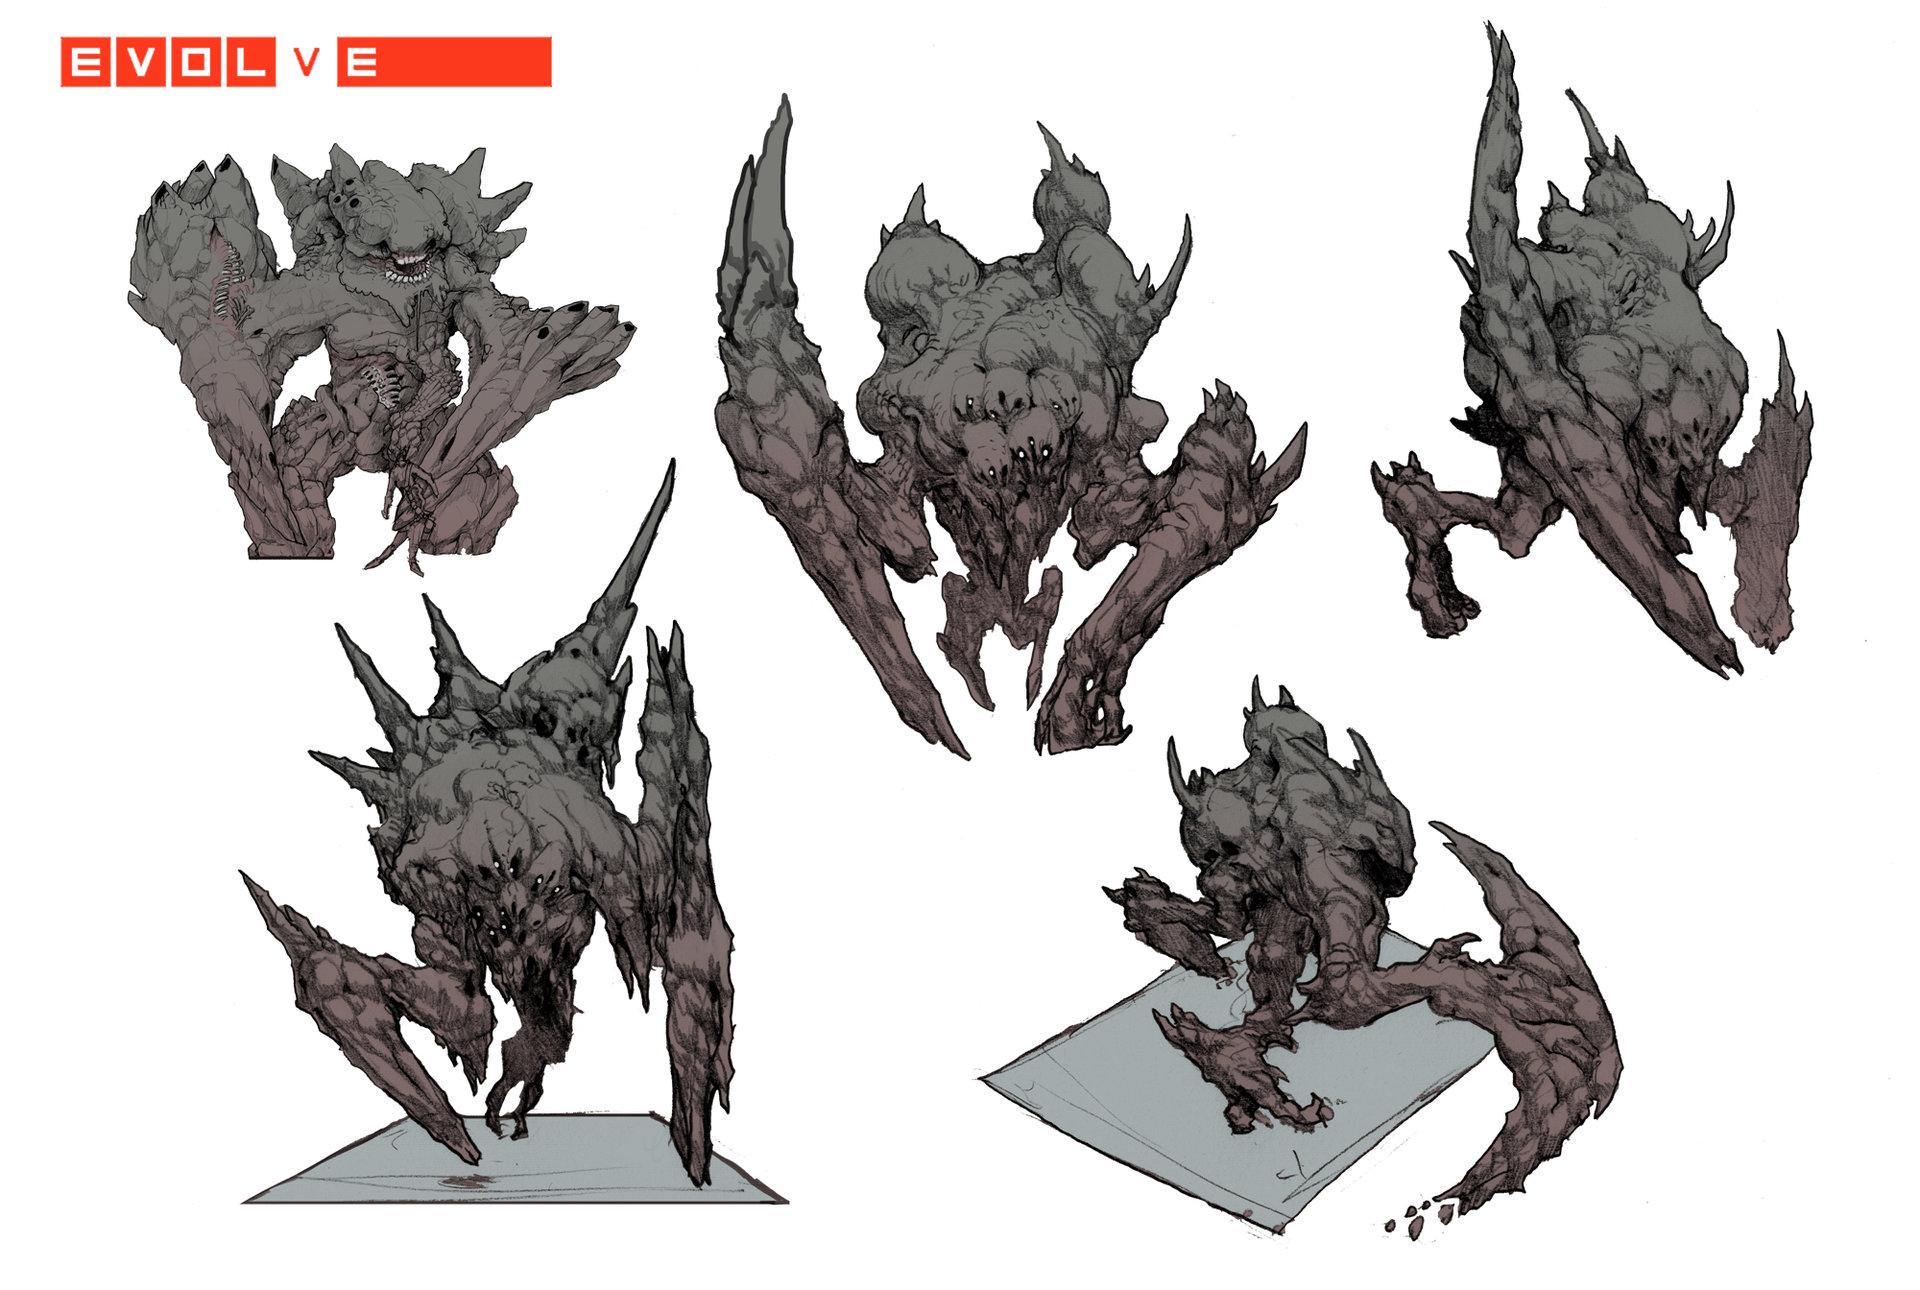 Evolve concept art behemoth первая версия